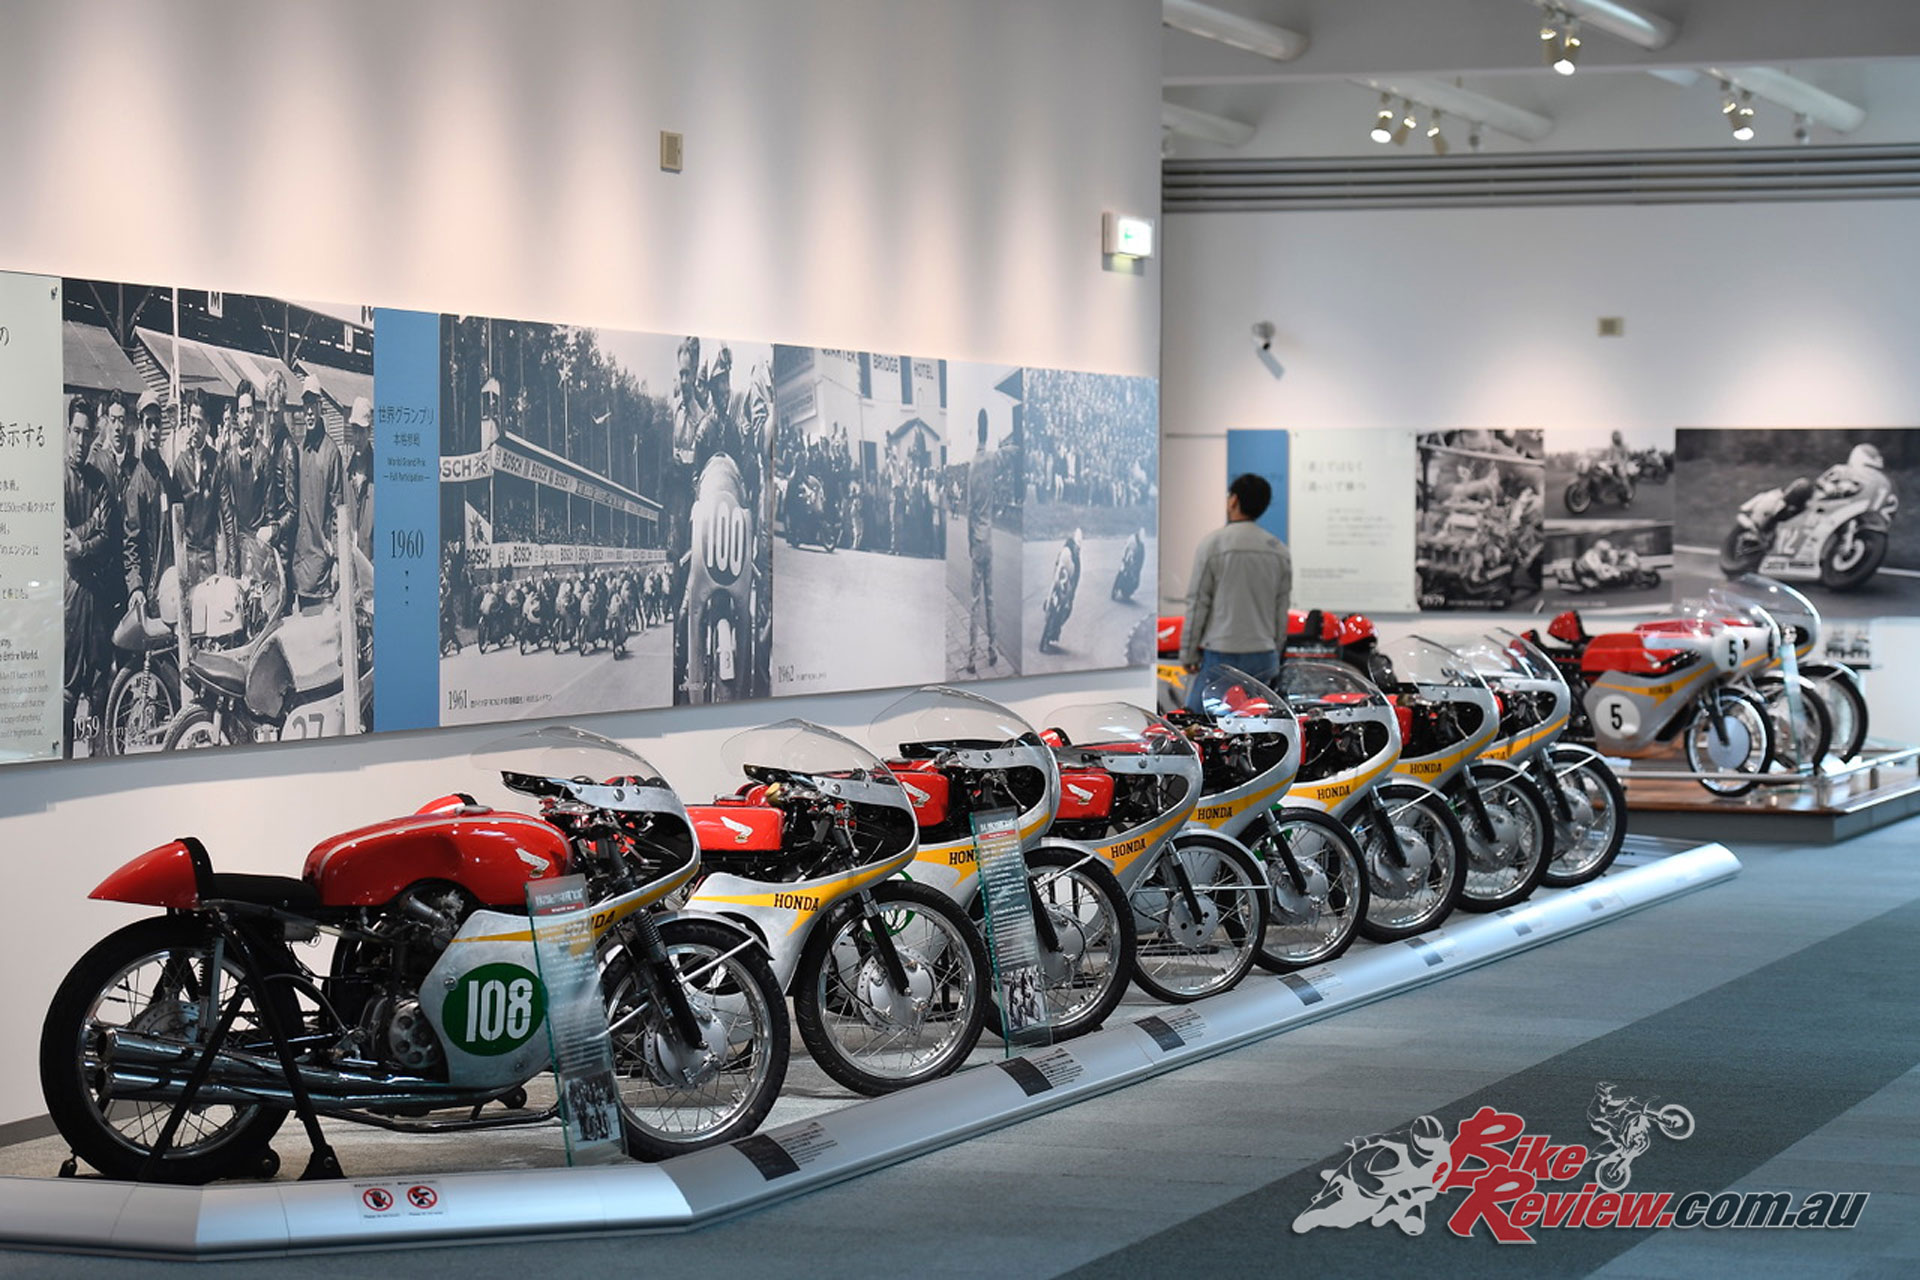 The Honda collection